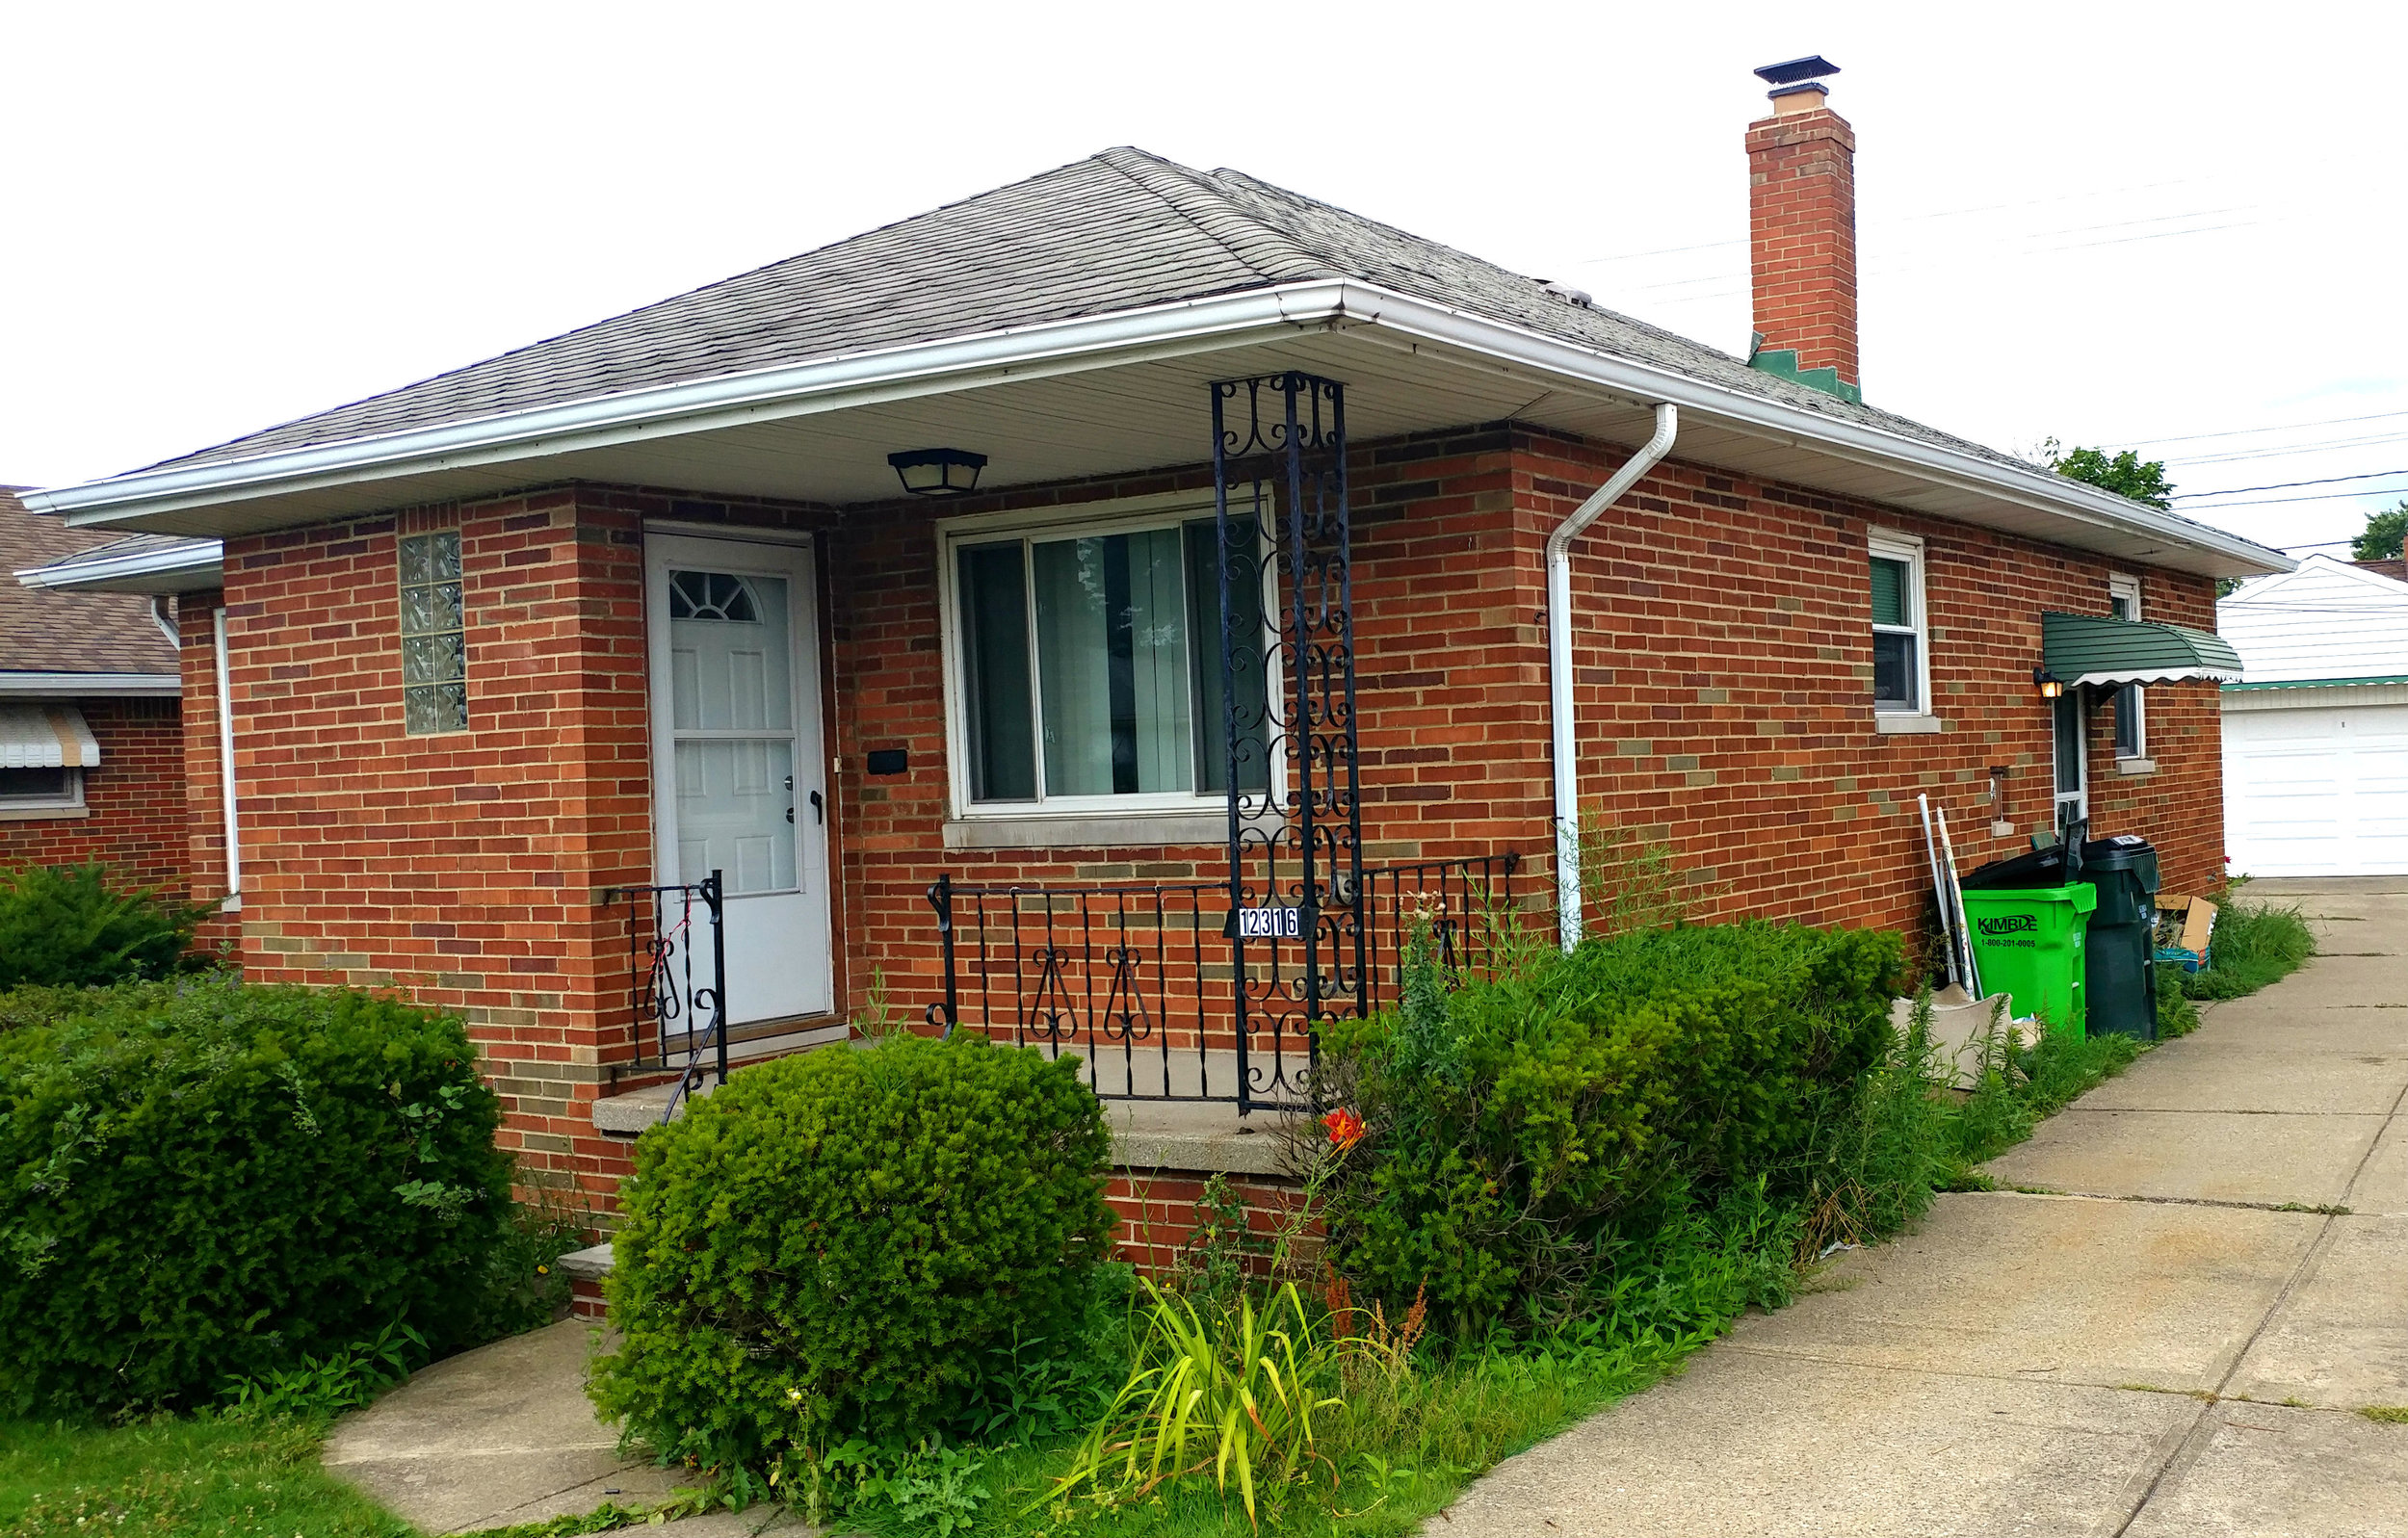 12316 Oakview Blvd., Garfield Hts. | 3 bed 2 bath | 1,729 Sq. Ft. | $41,000